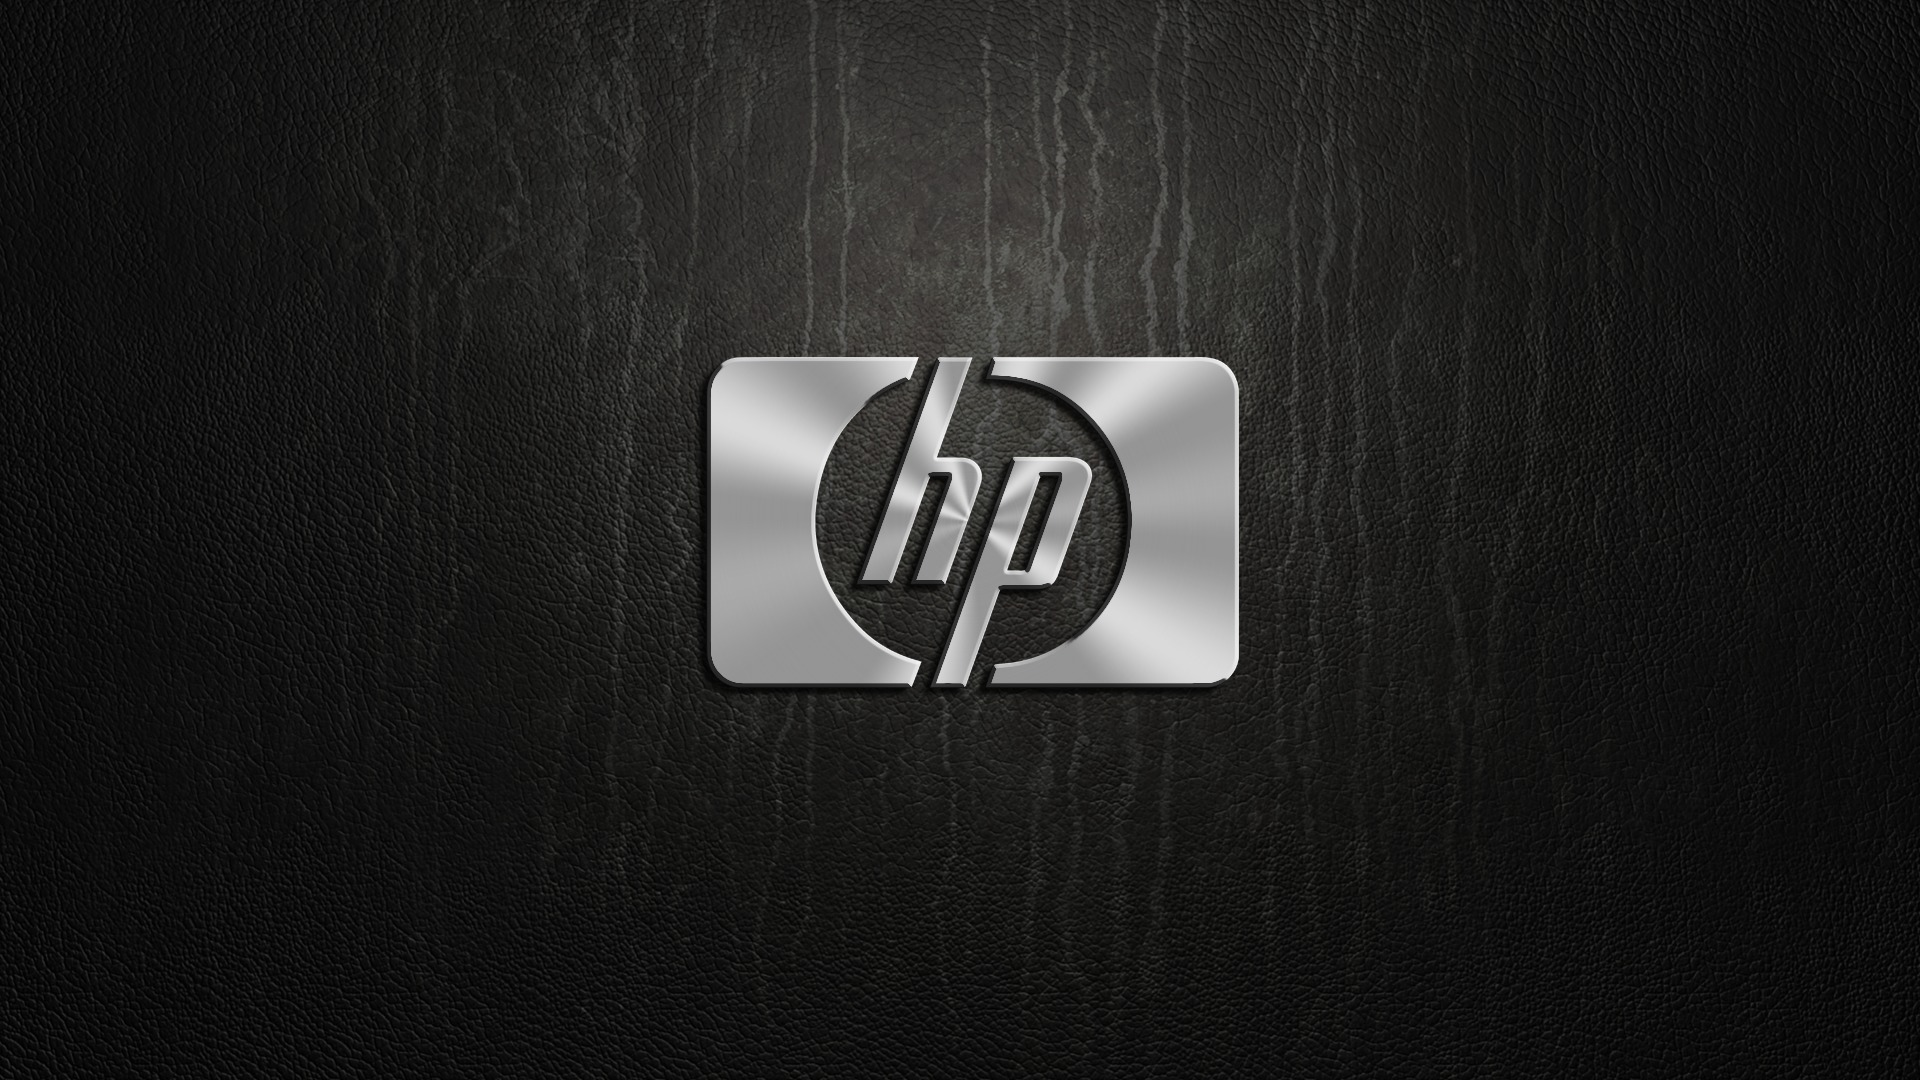 cool hp logo wallpaper - photo #21